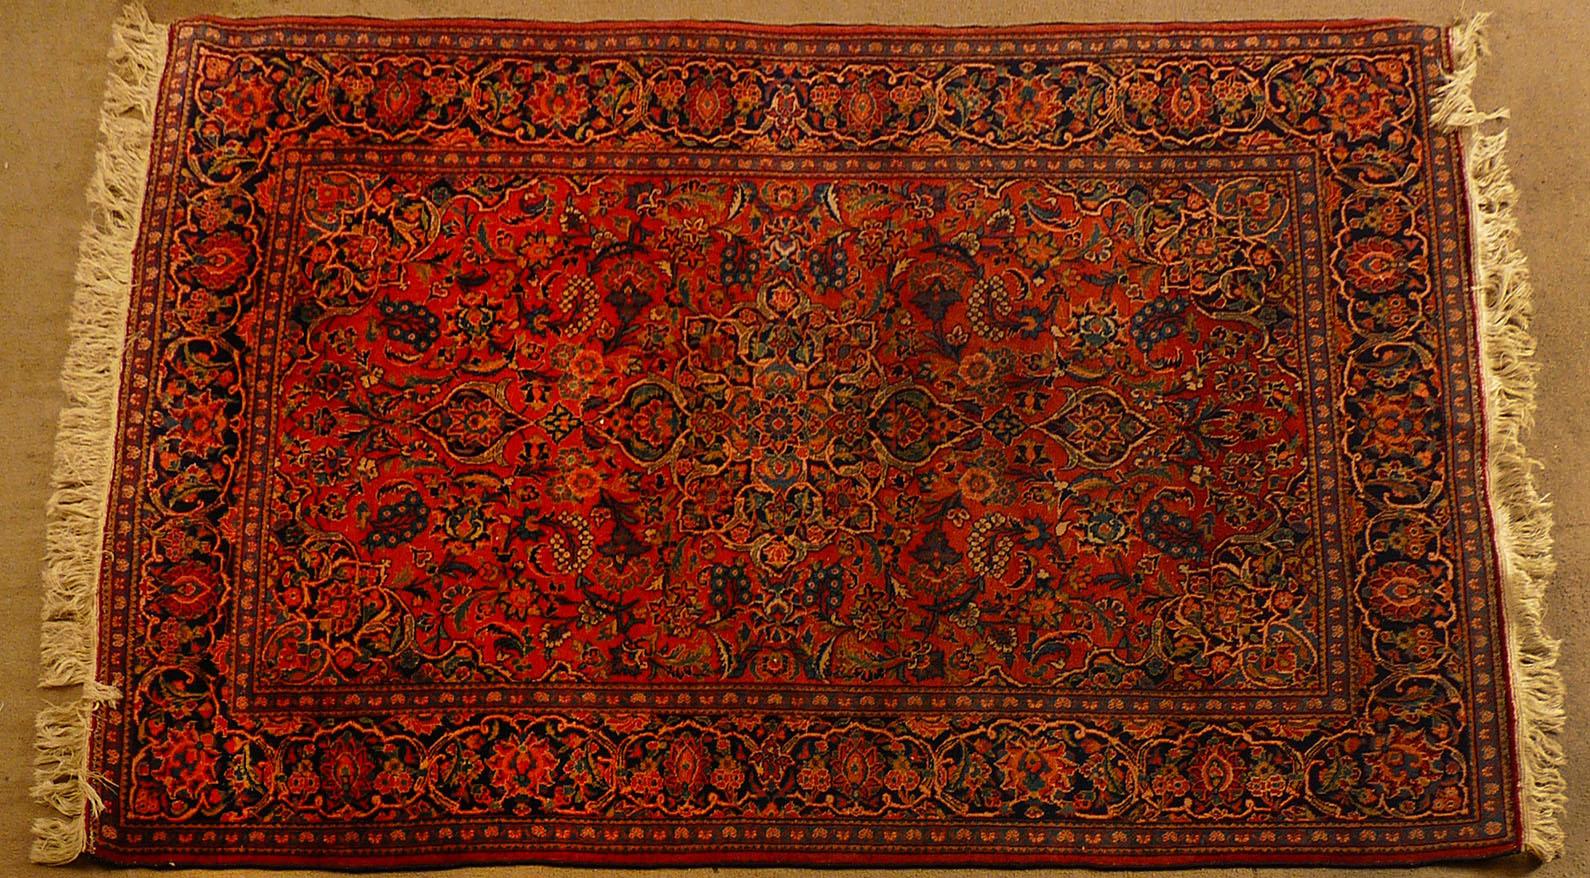 Bgw remate 264 alfombra gek htm gendata for Alfombra persa azul